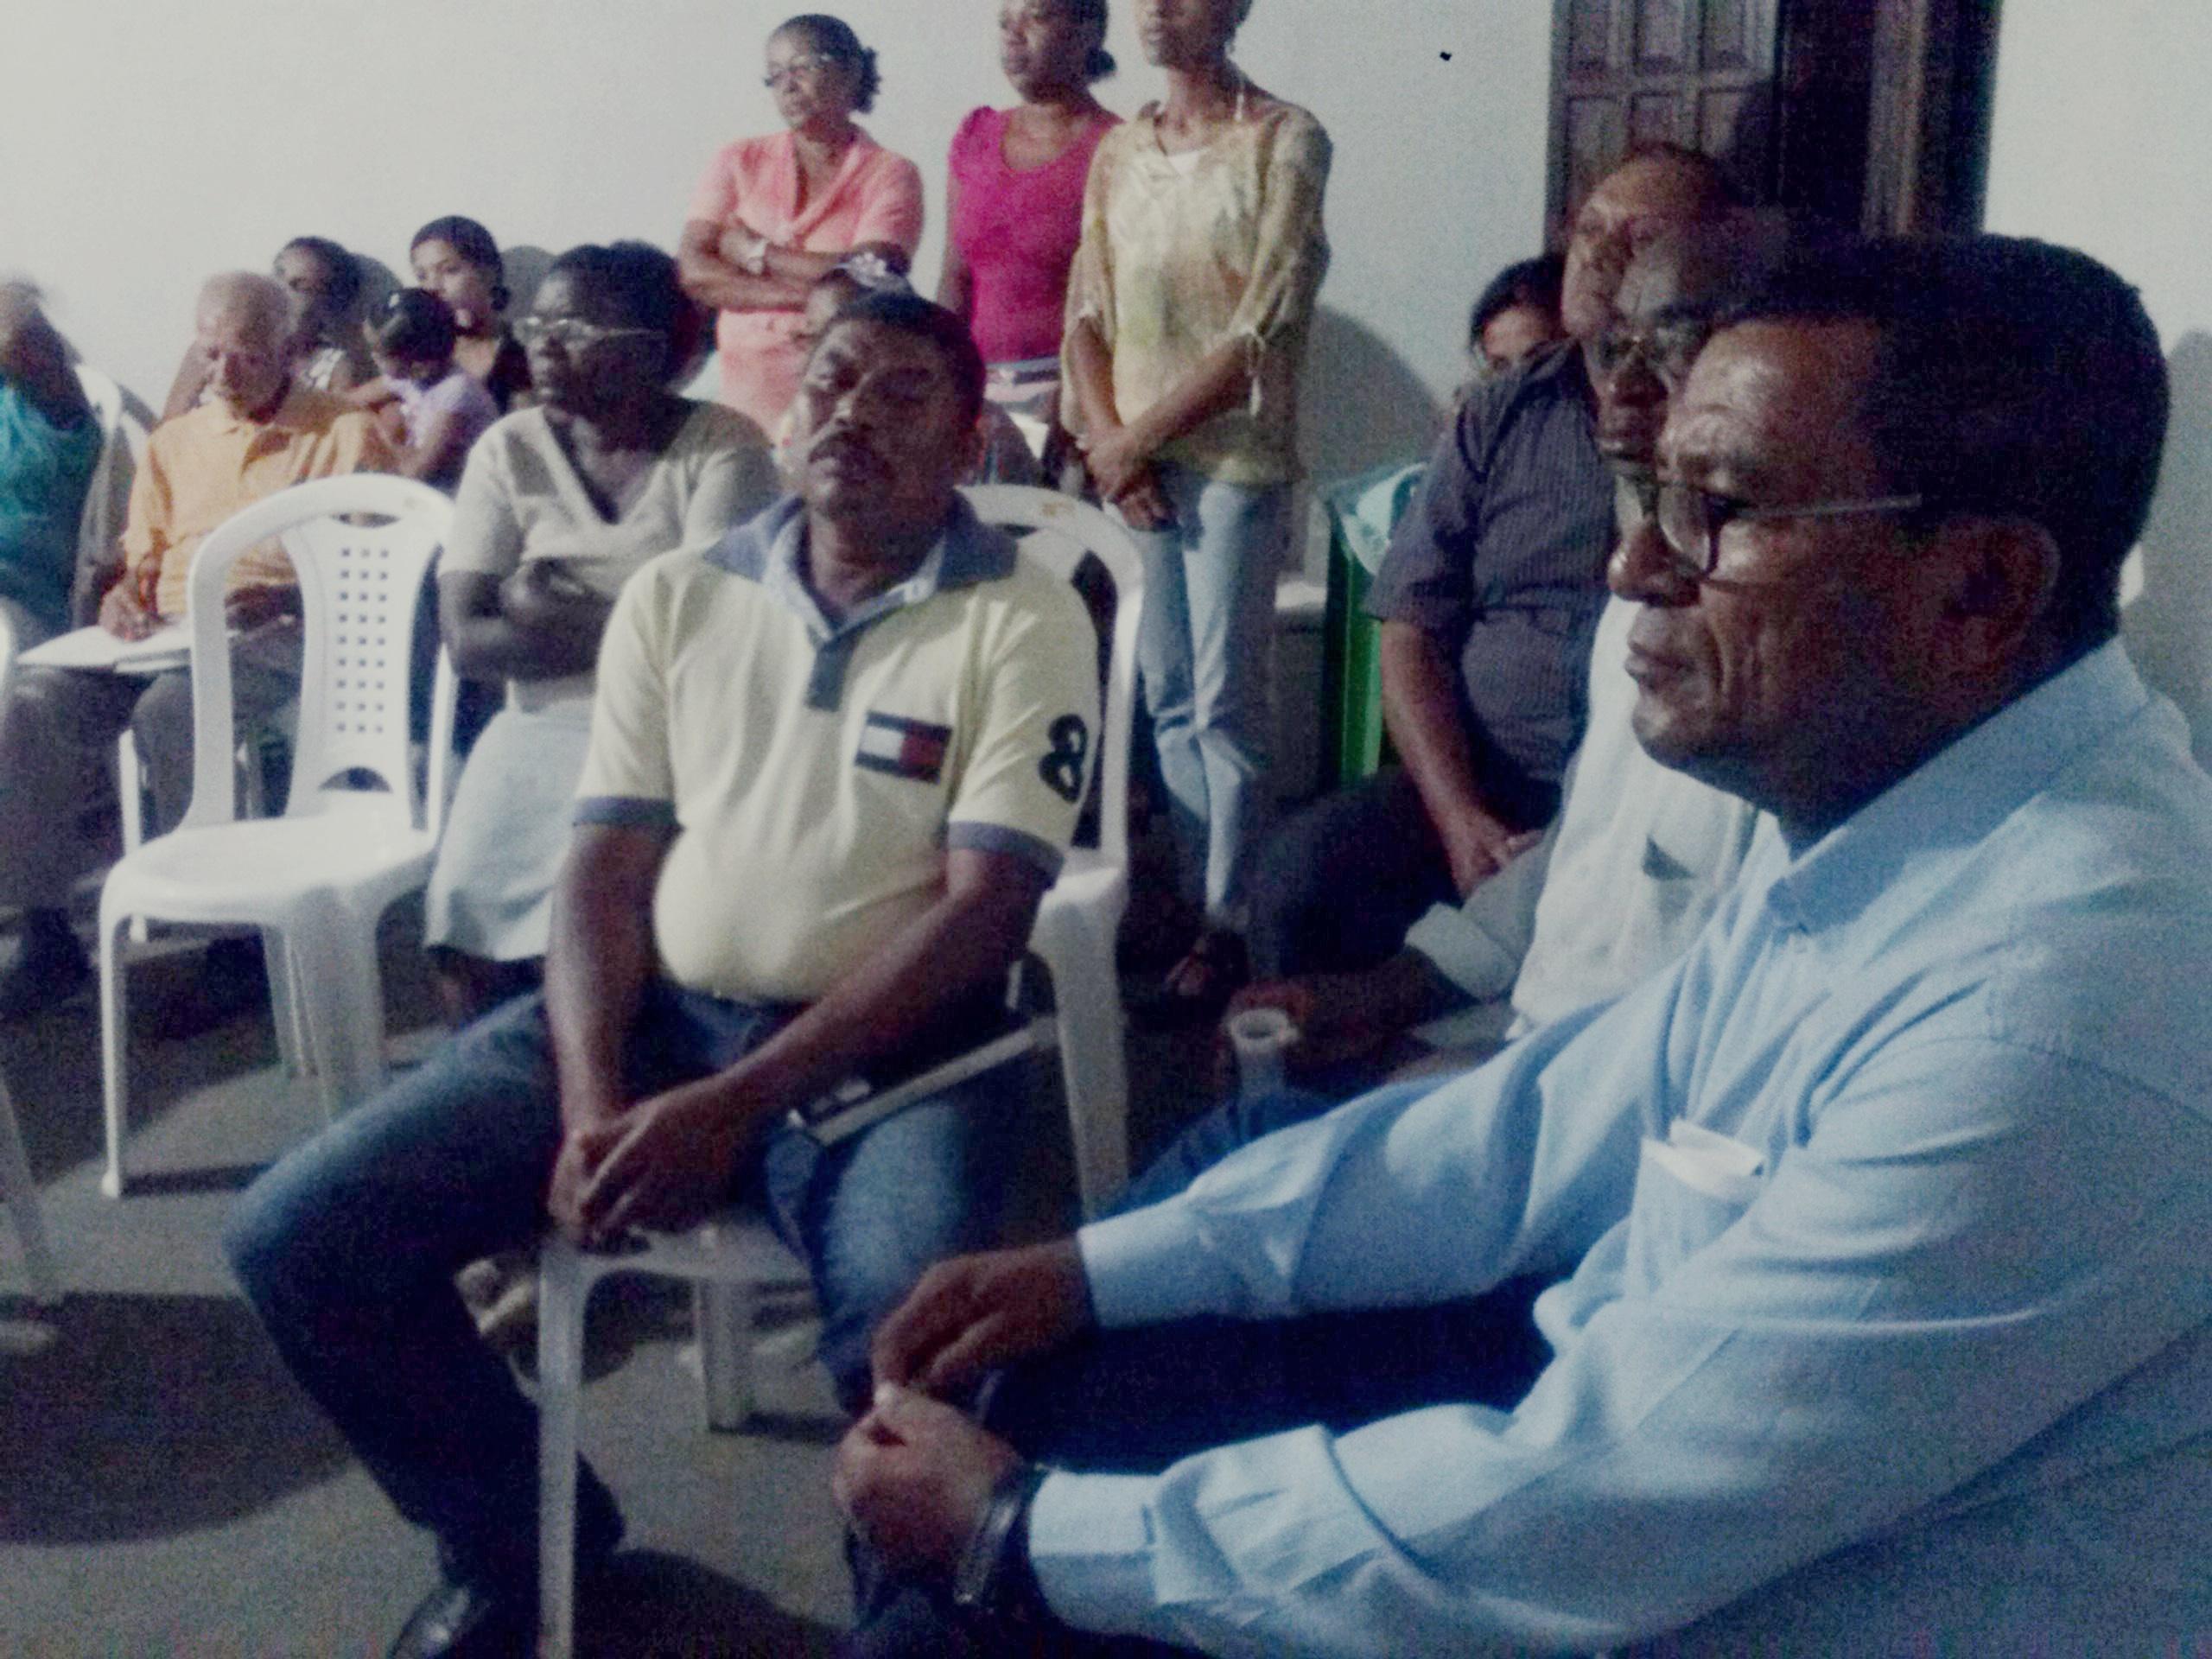 Vereador Djalma Santos participa de reuni£o itinerante da UAMA no